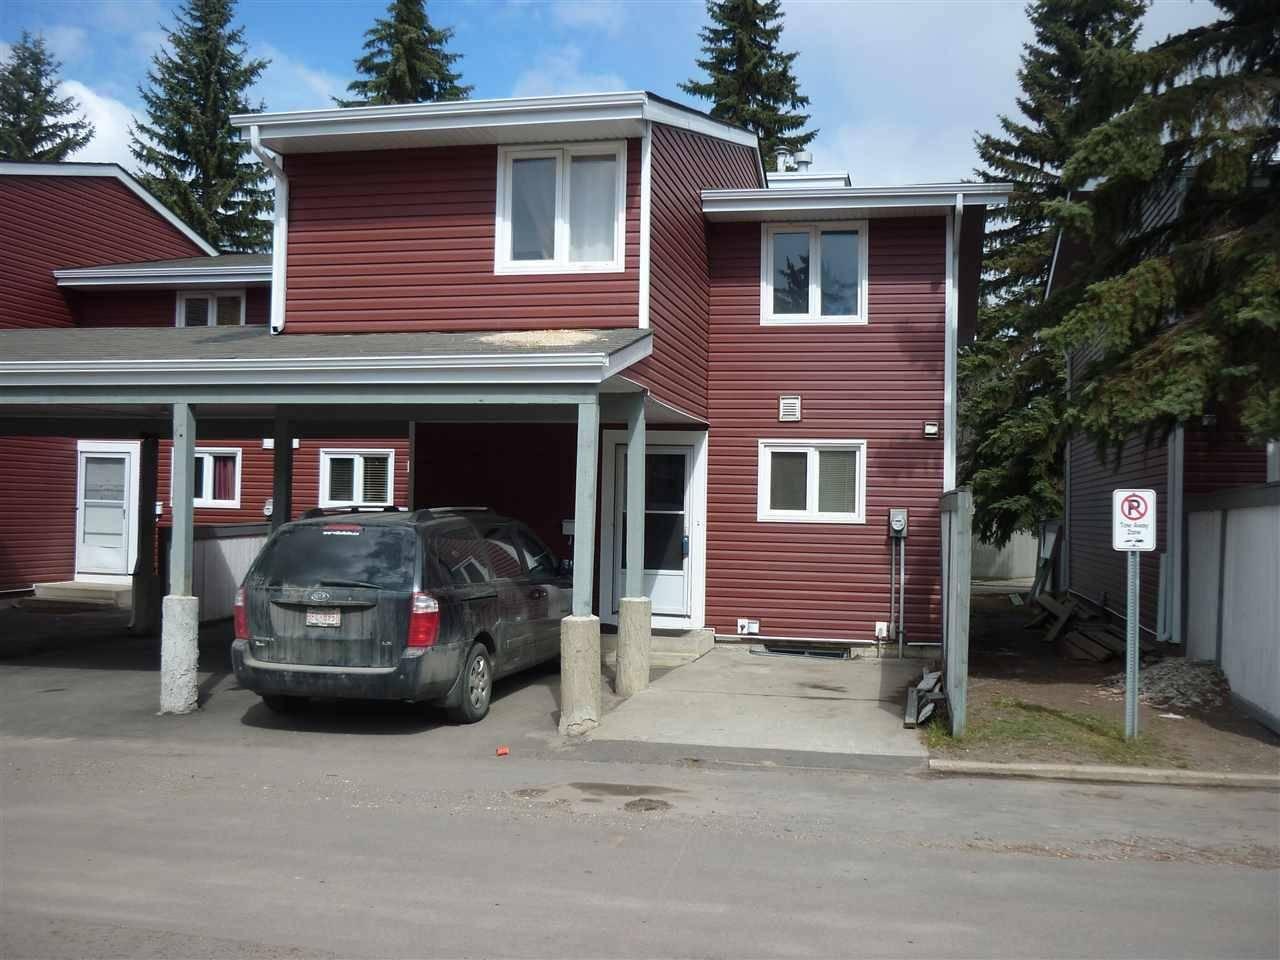 Townhouse for sale at 1904 48 St Nw Unit 46 Edmonton Alberta - MLS: E4154380